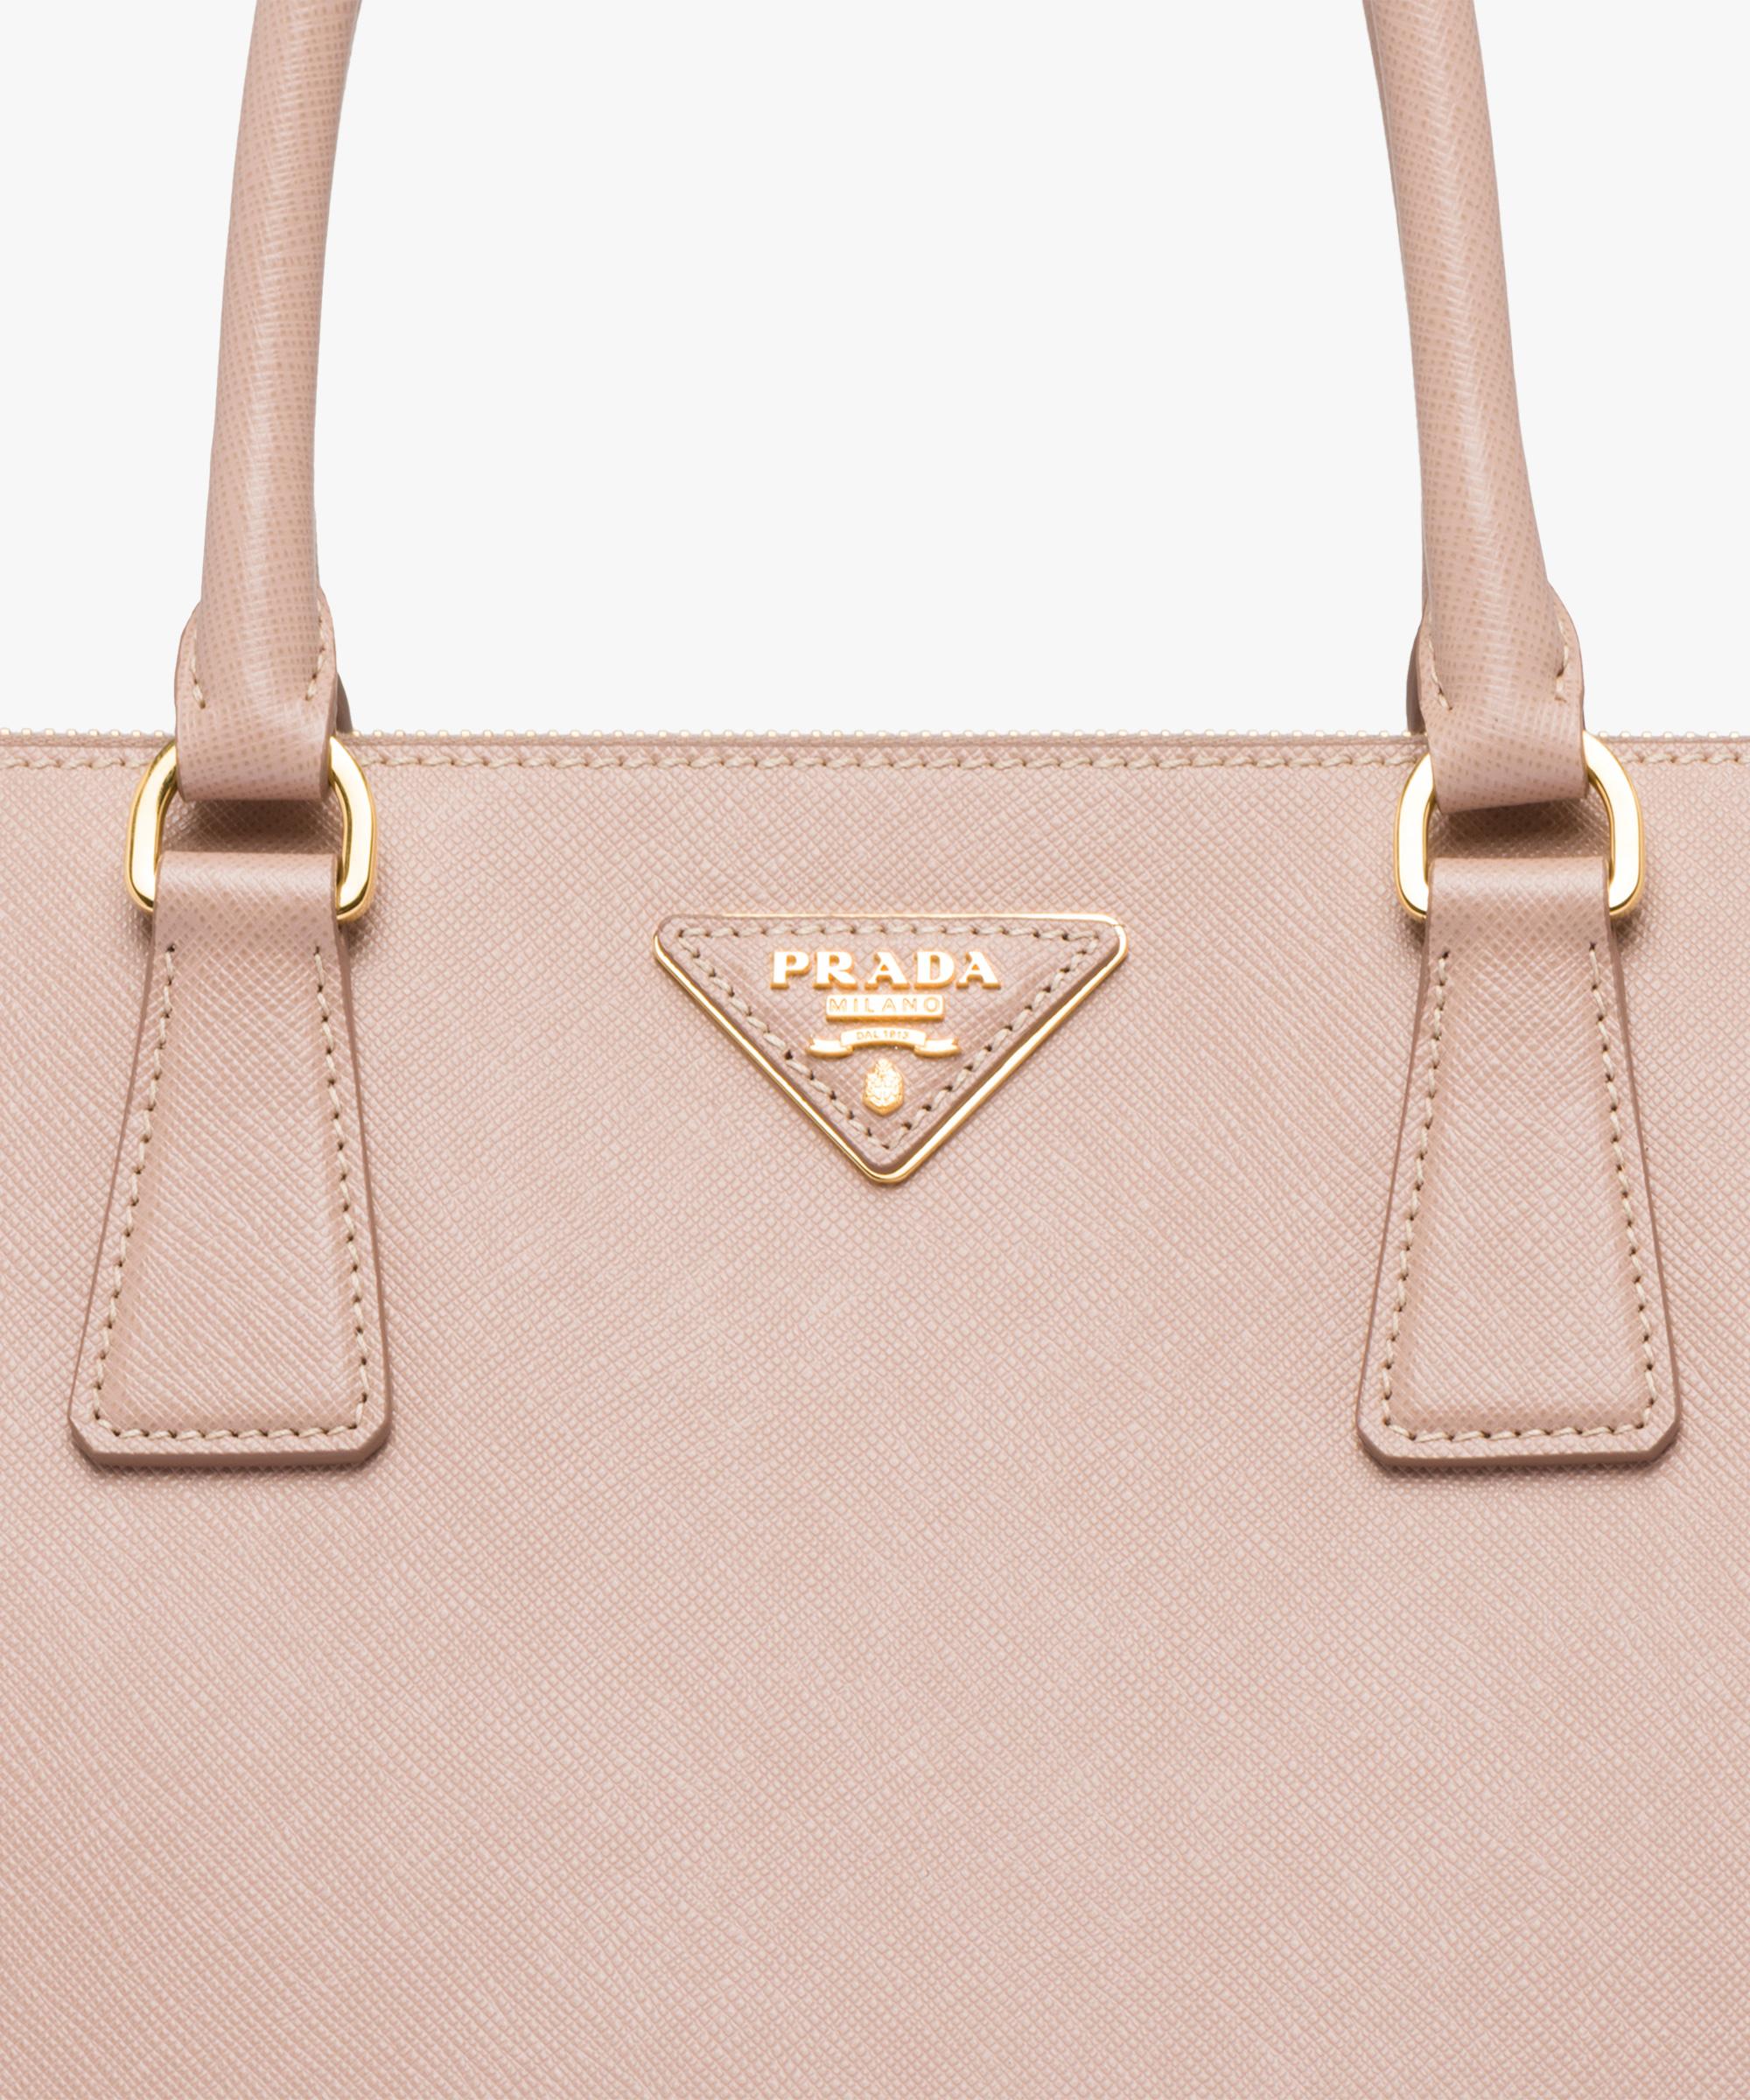 cdbd2ea0b99cf5 ... Prada Galleria Large Saffiano Leather Bag Prada POWDER PINK ...